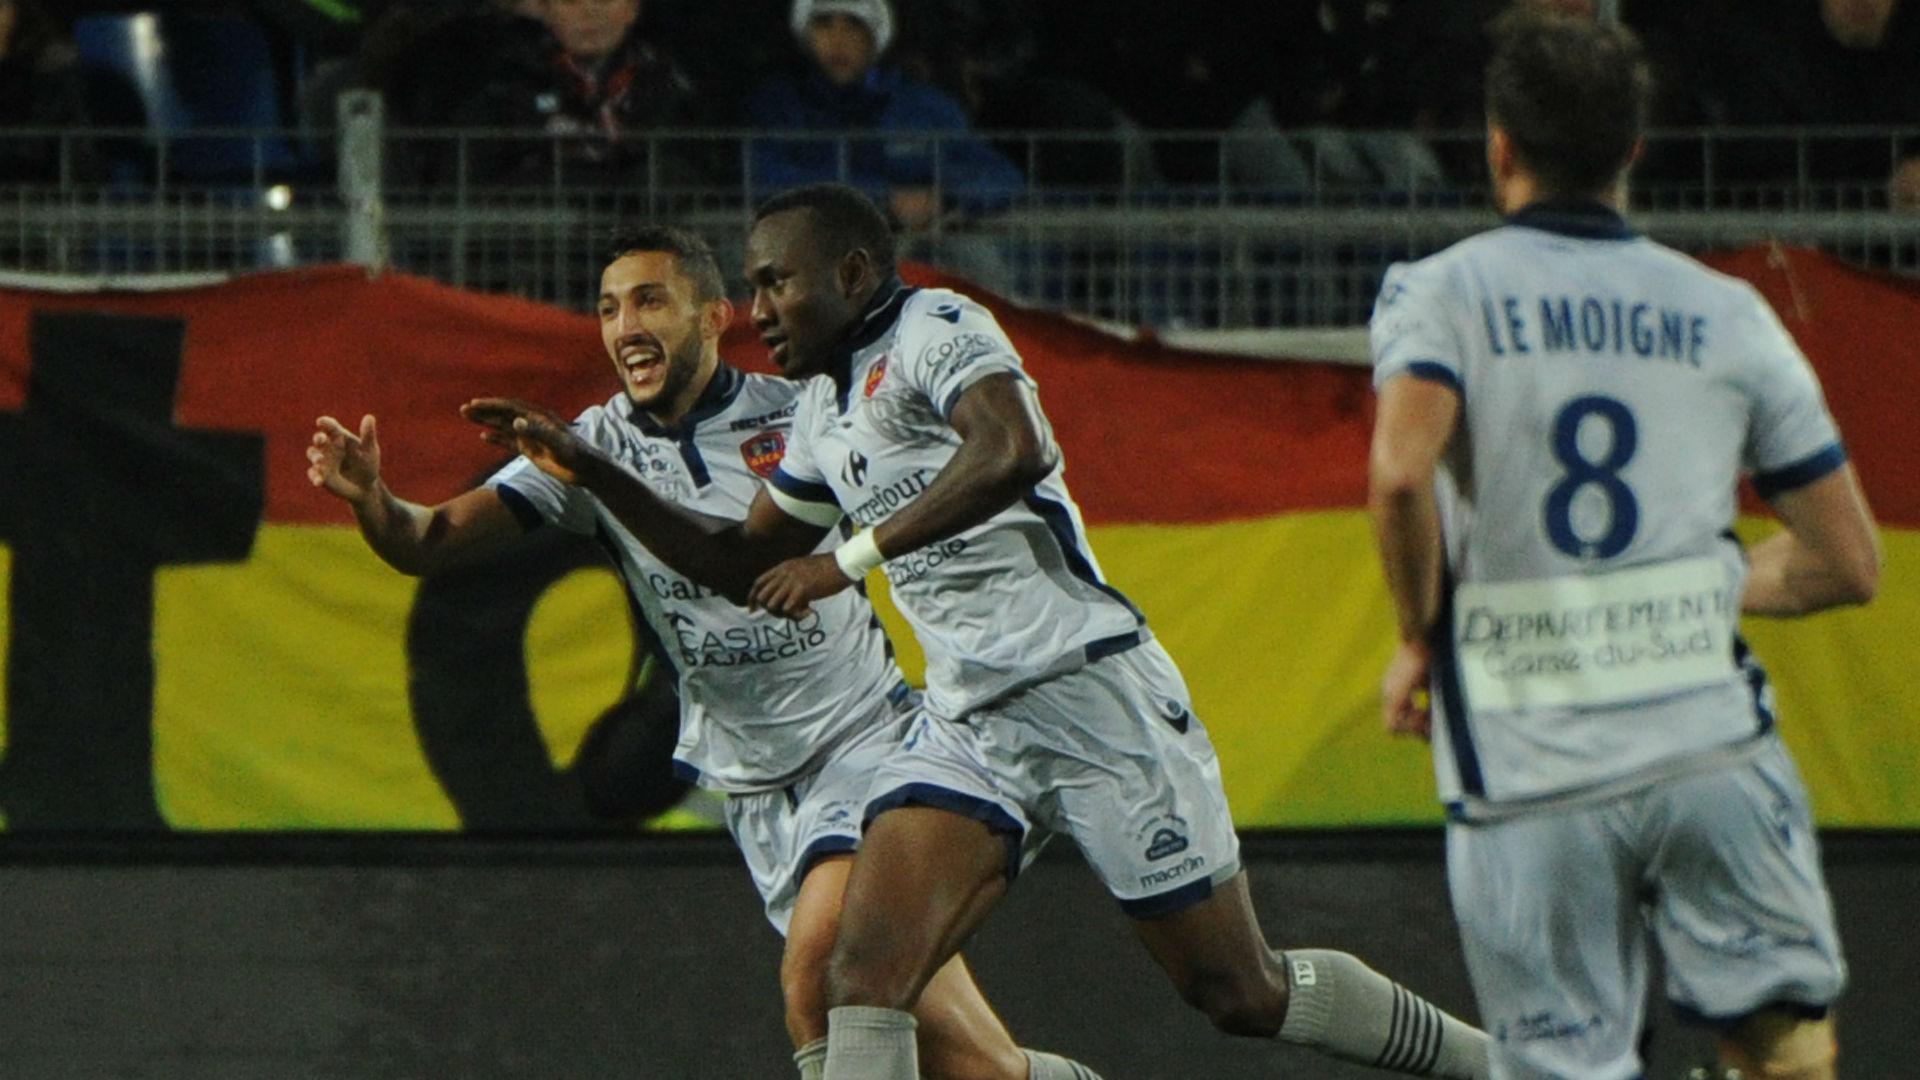 Video: Montpellier vs Gazelec Ajaccio